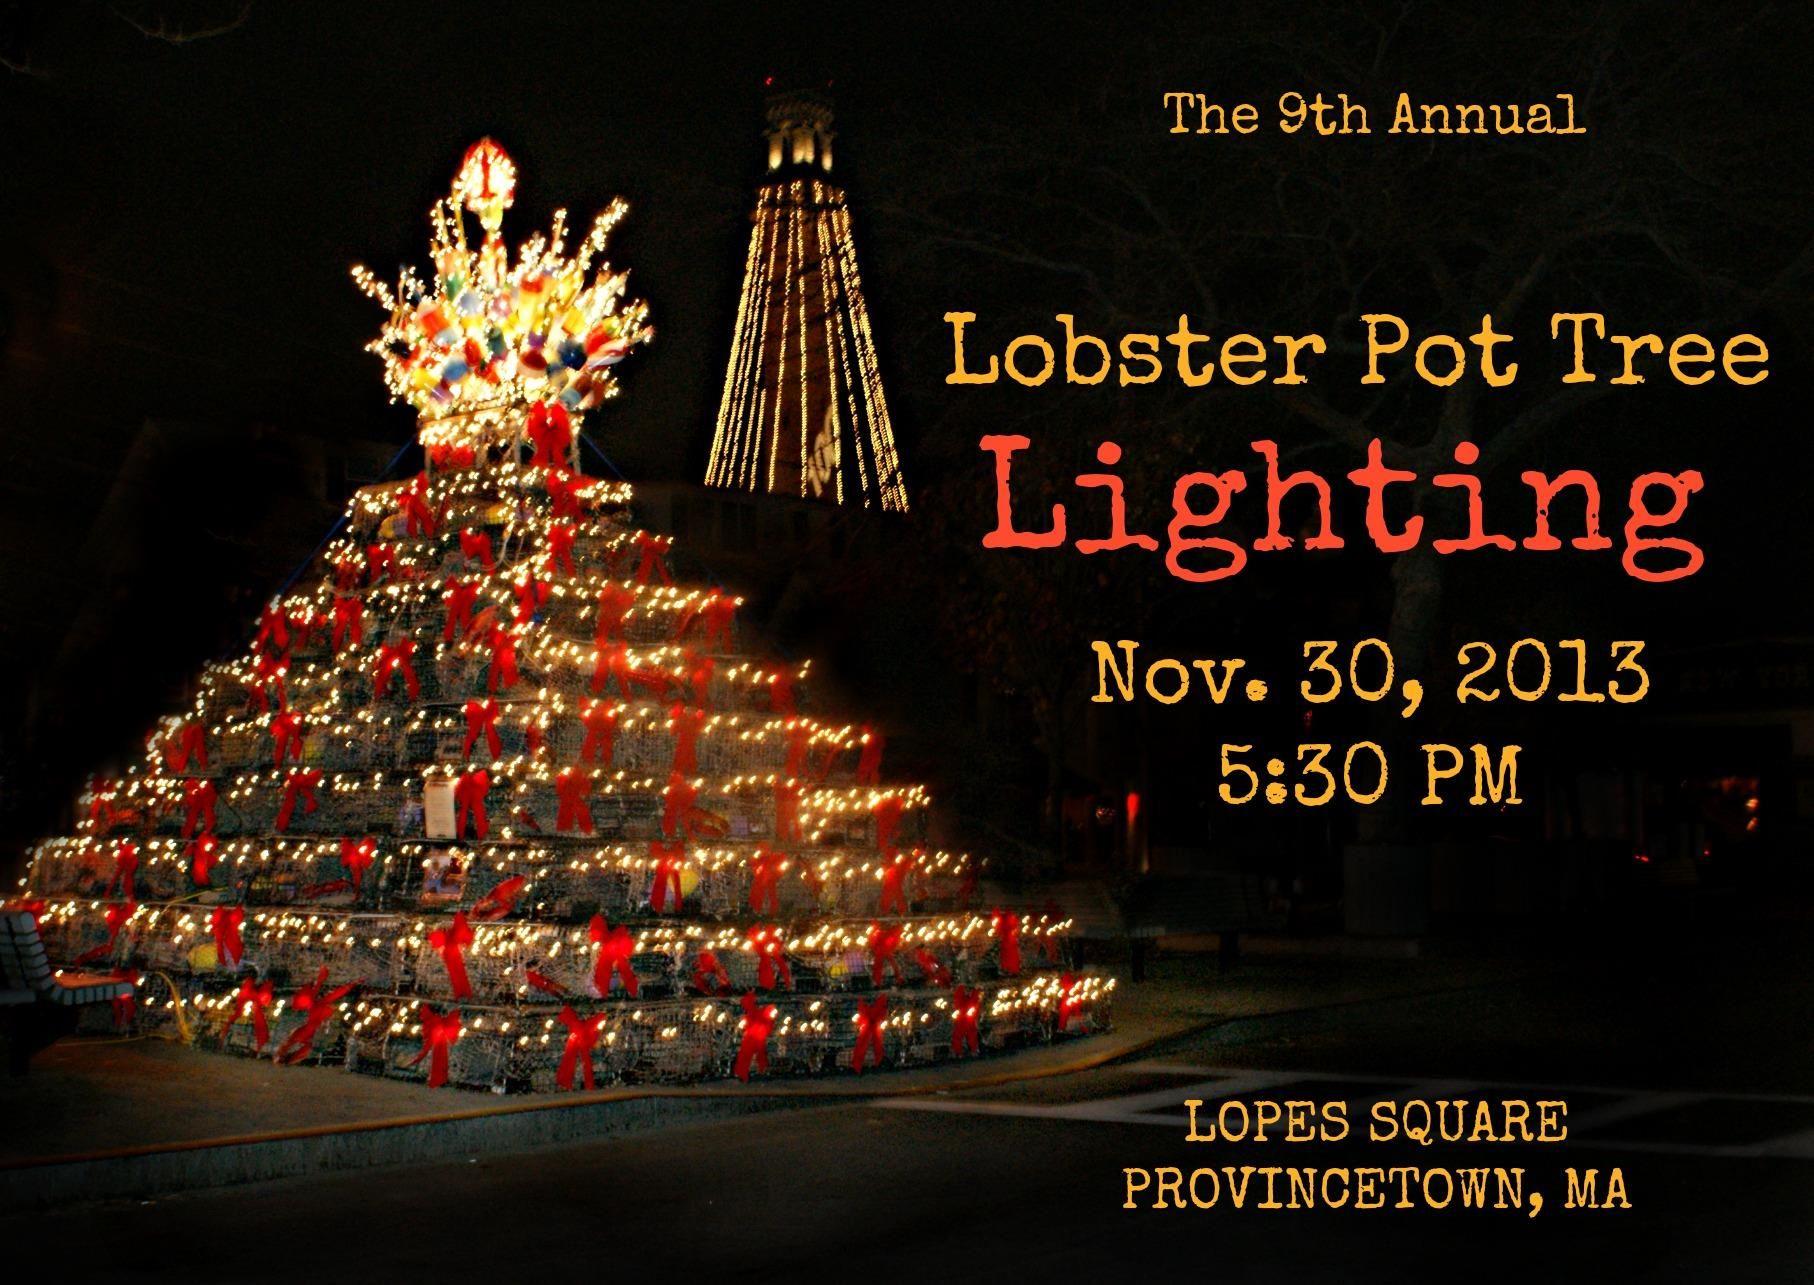 Lobster Pot Tree Lighting 2013 Potted trees, Tree